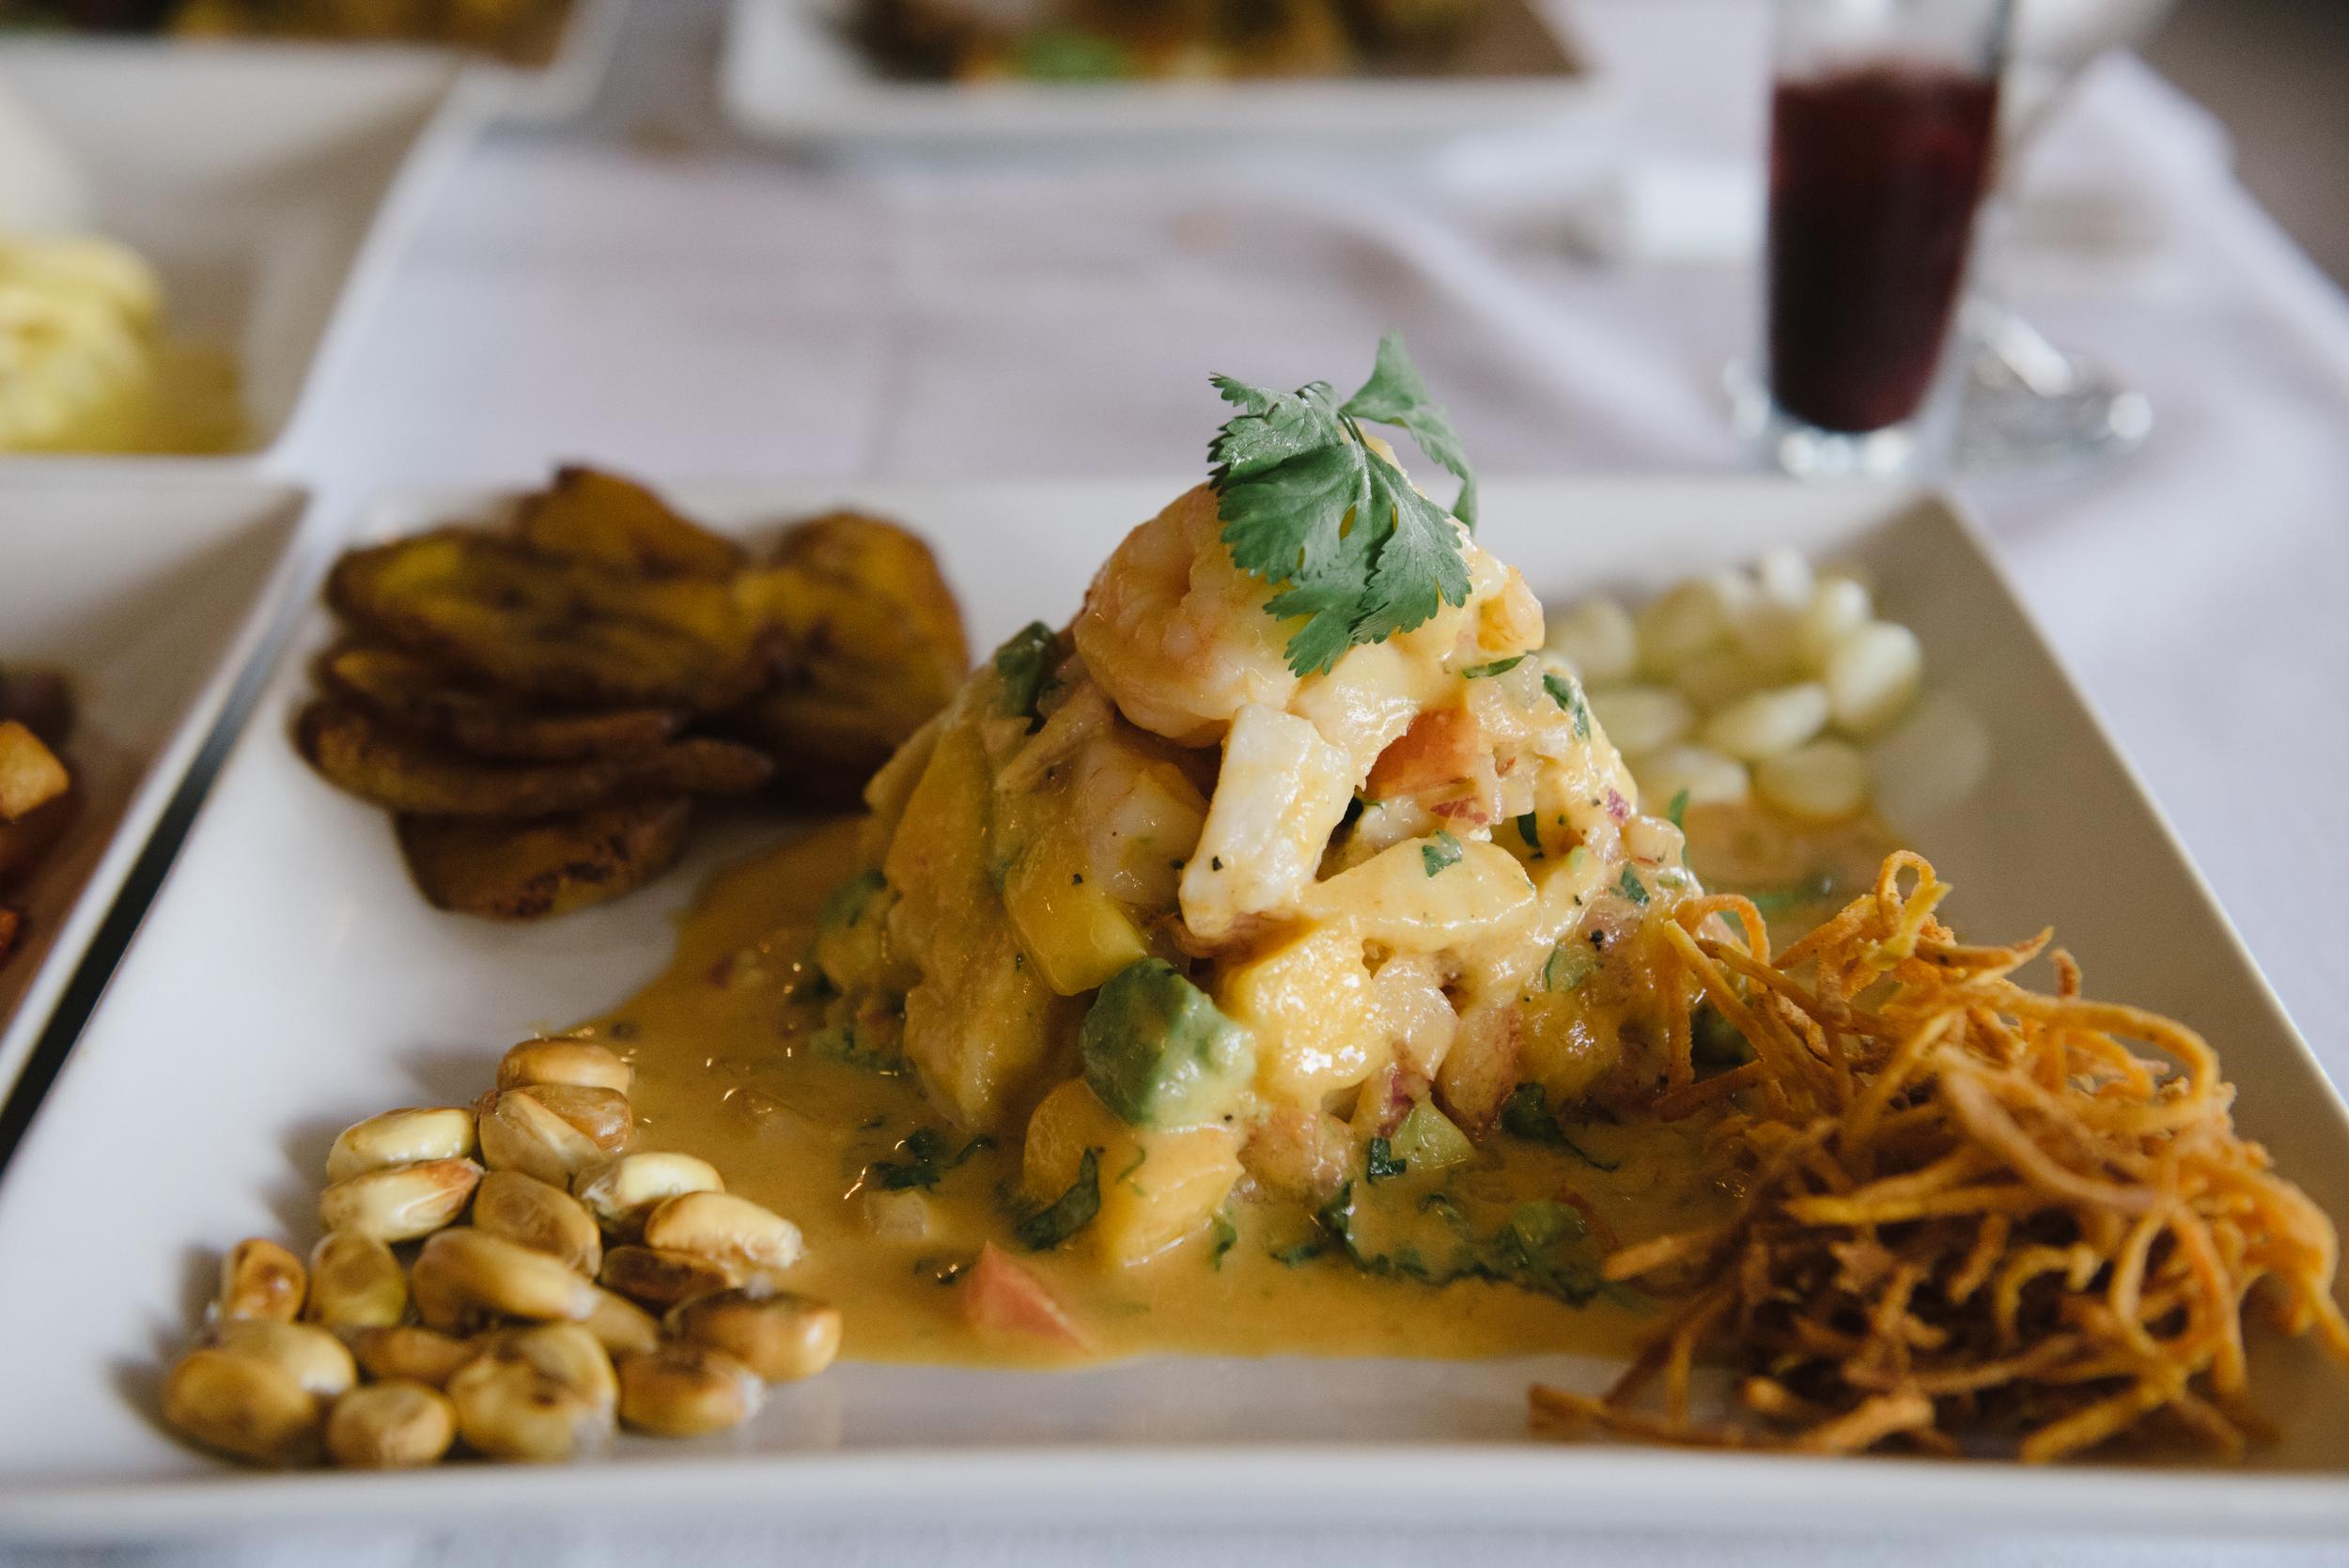 Ceviche Nativo (Shrimp, Fish, Mango, Avacado)